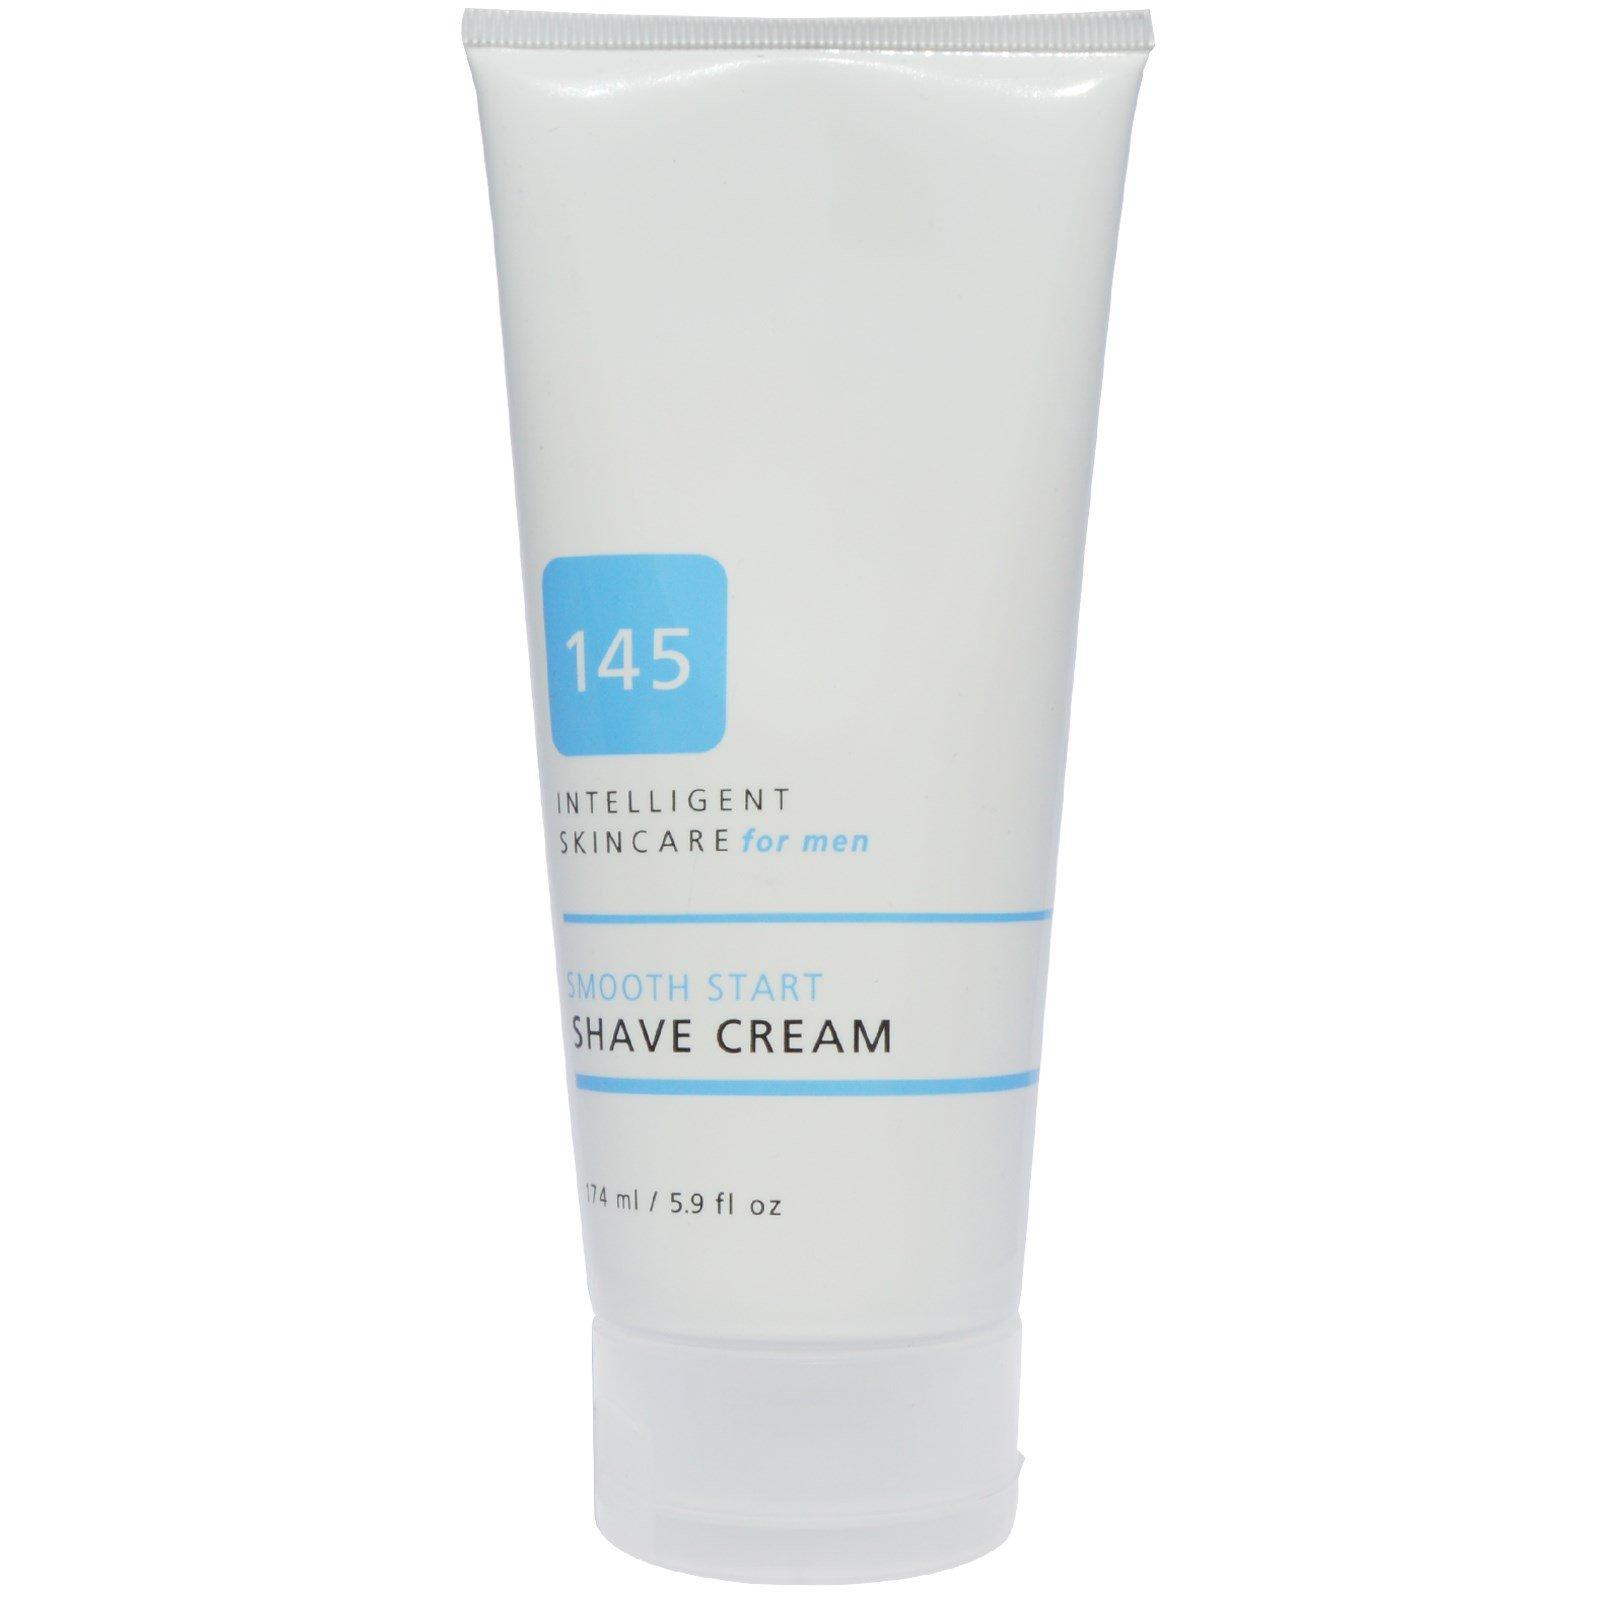 145 Intelligent Skincare for Men, Smooth Start, Shave Cream, 5.9 fl. oz.